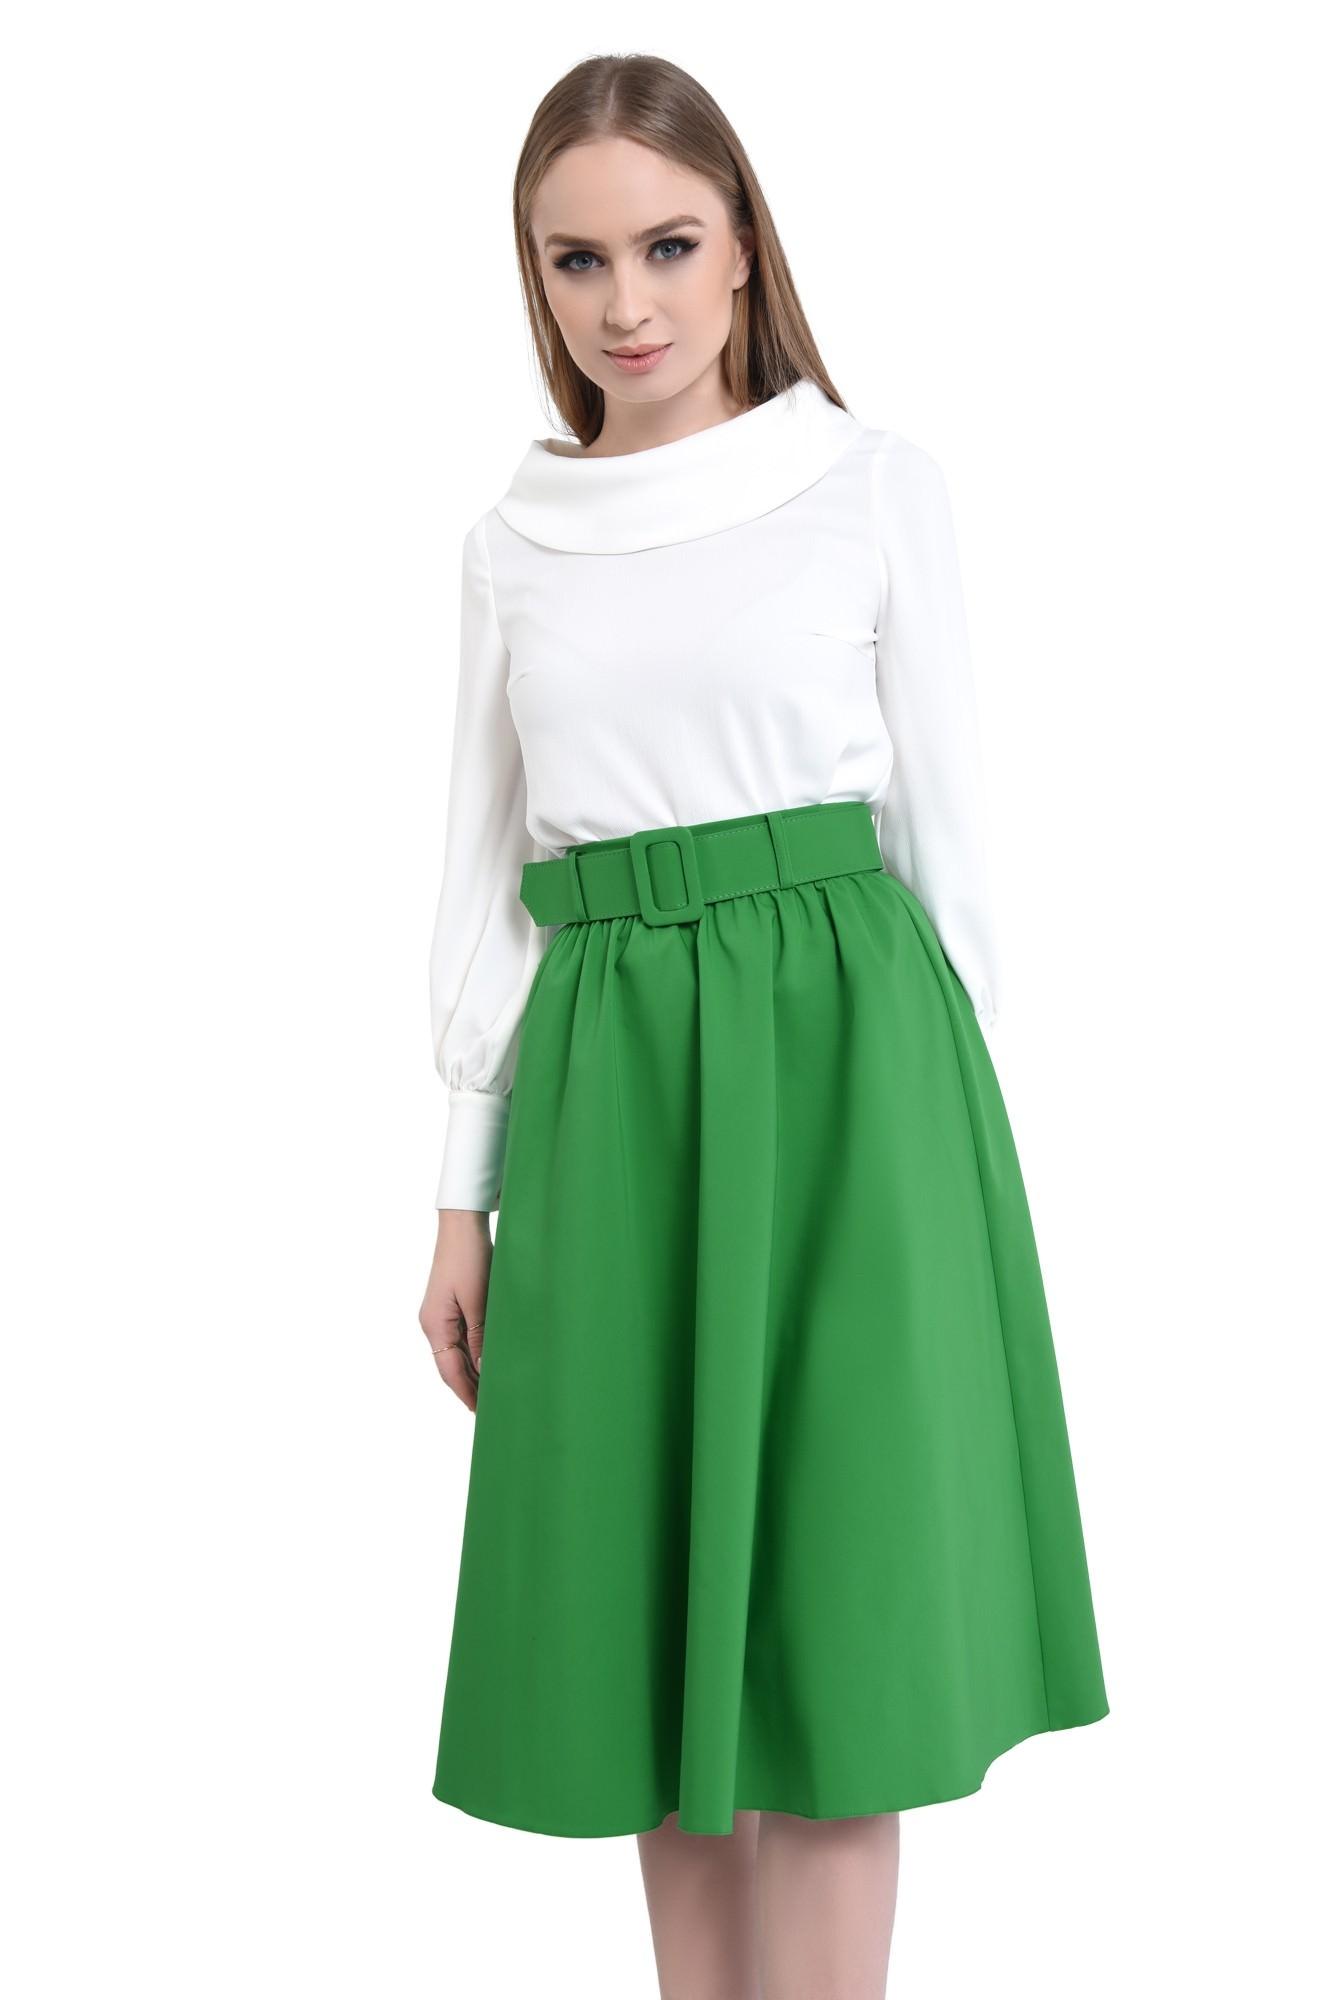 0 - Fusta casual, verde